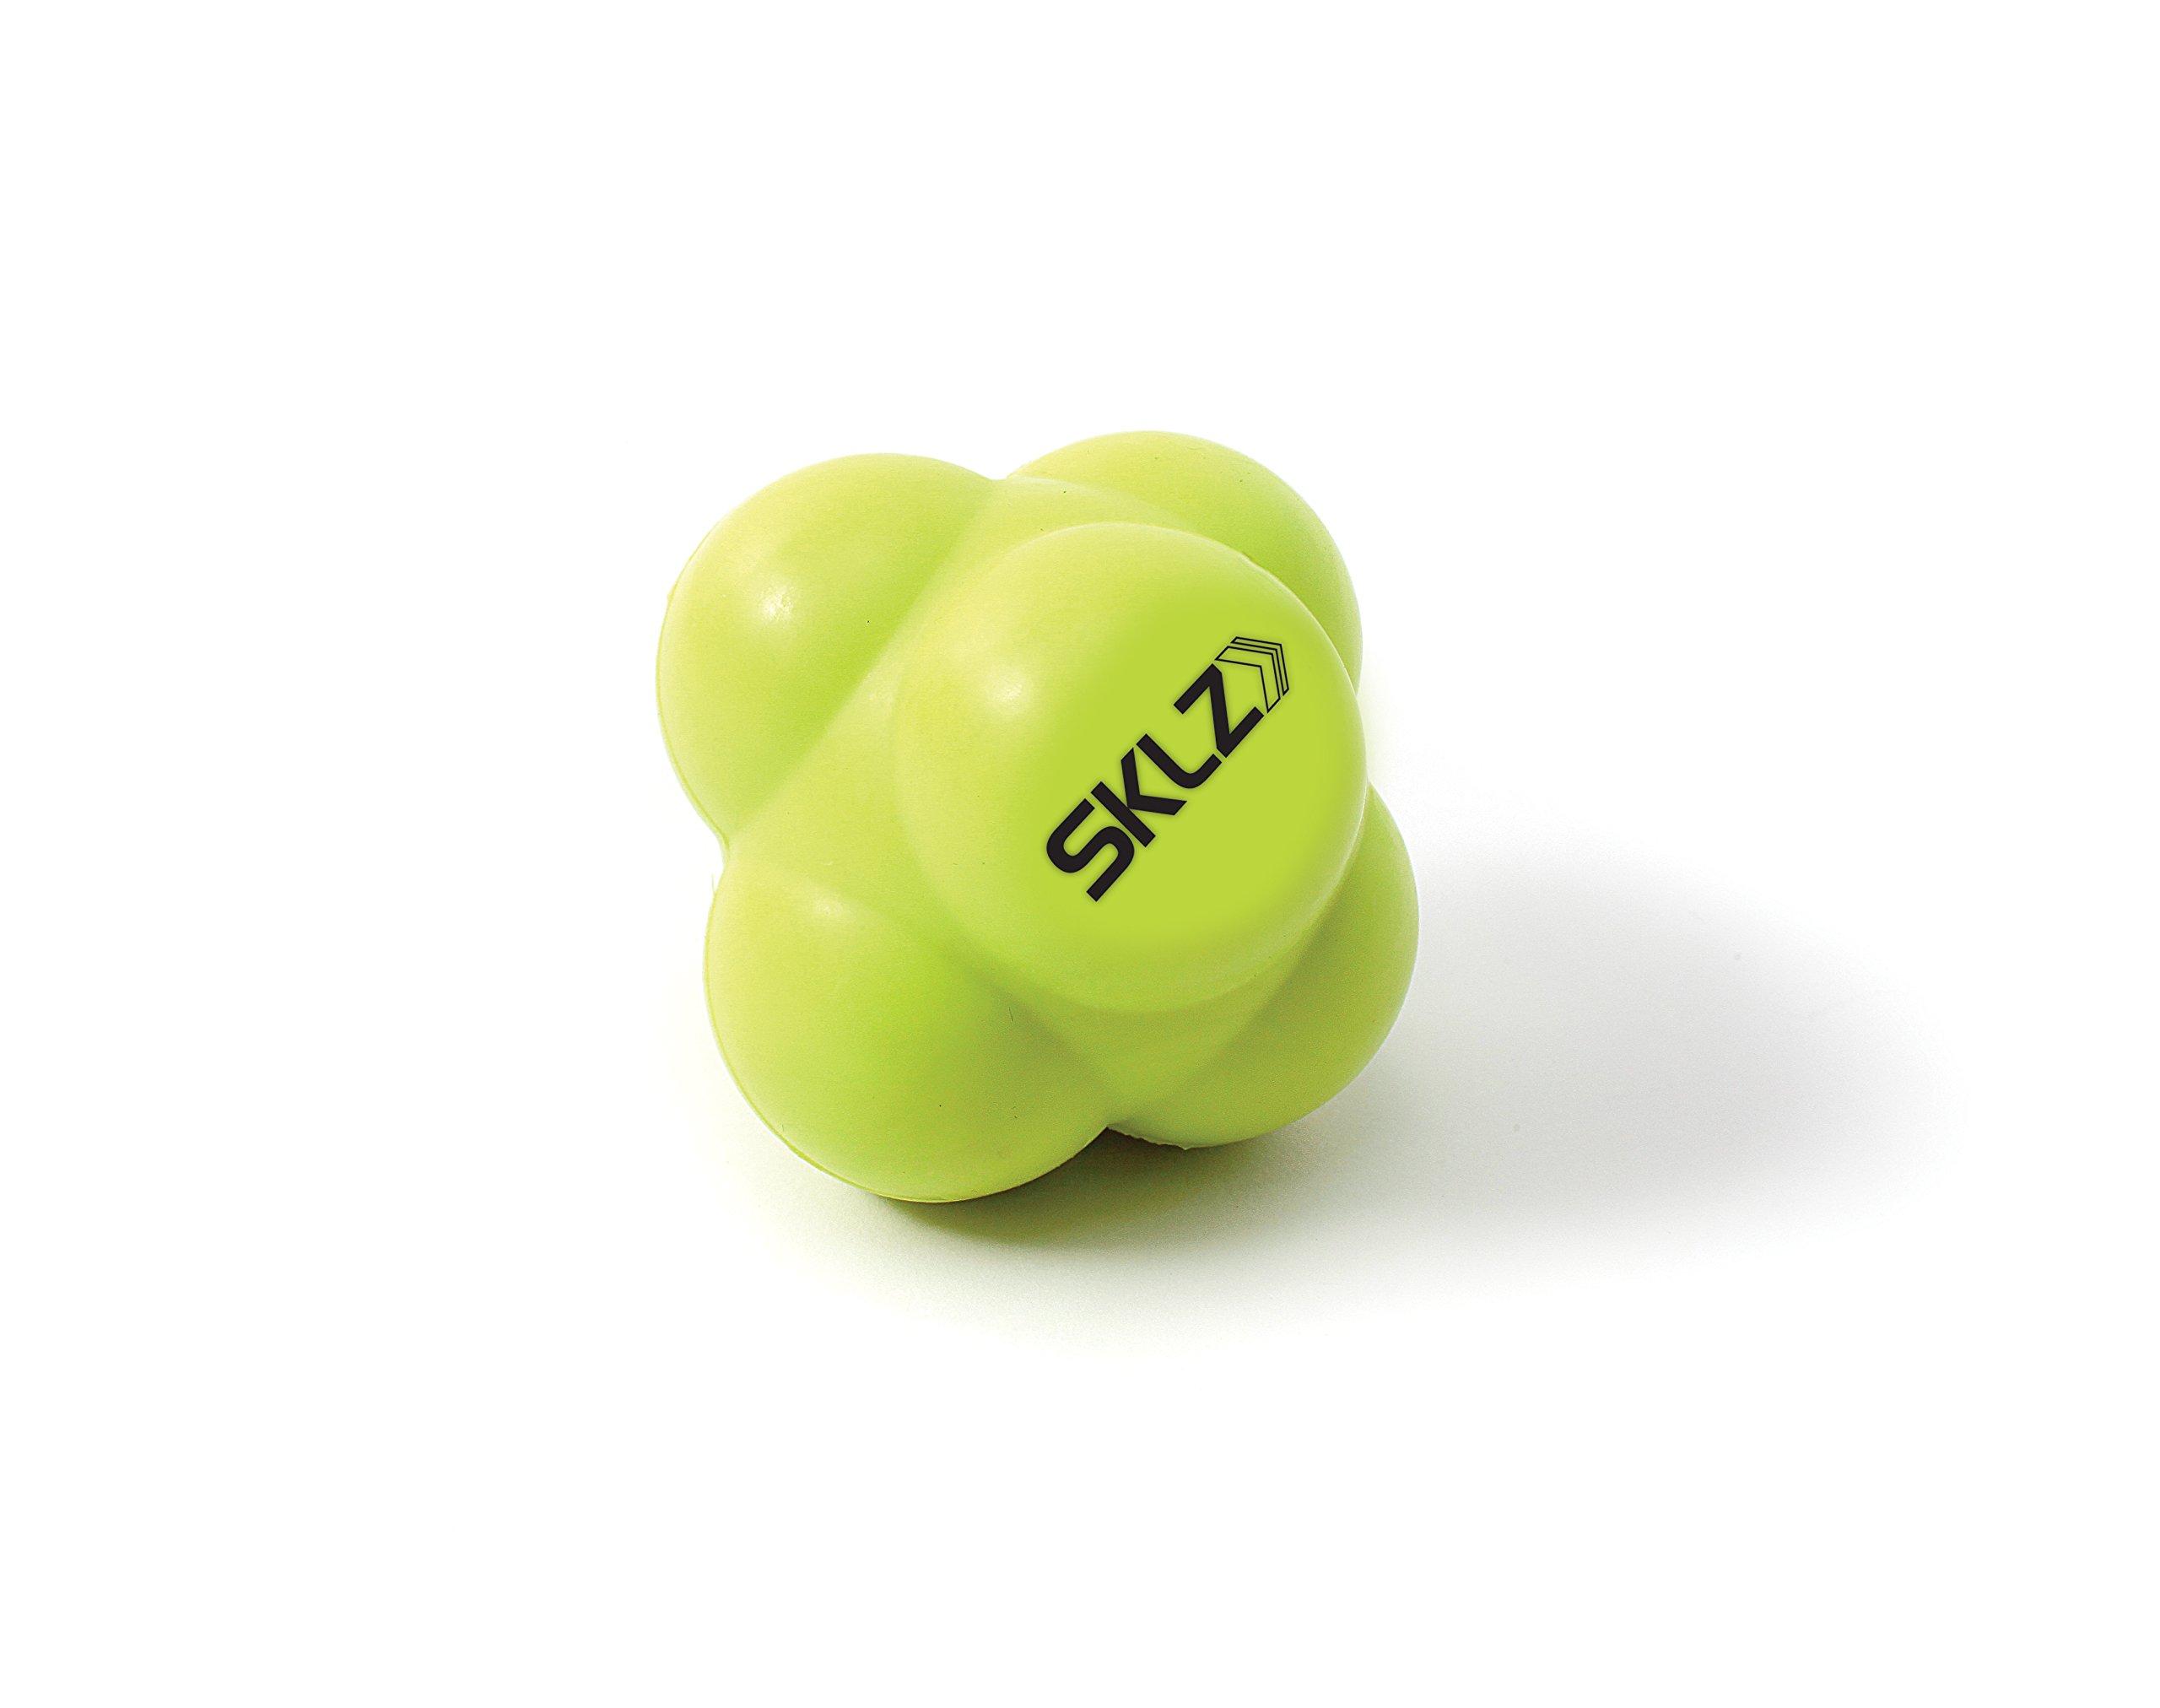 SKLZ Reaction Ball - Softball Size Agility Trainer